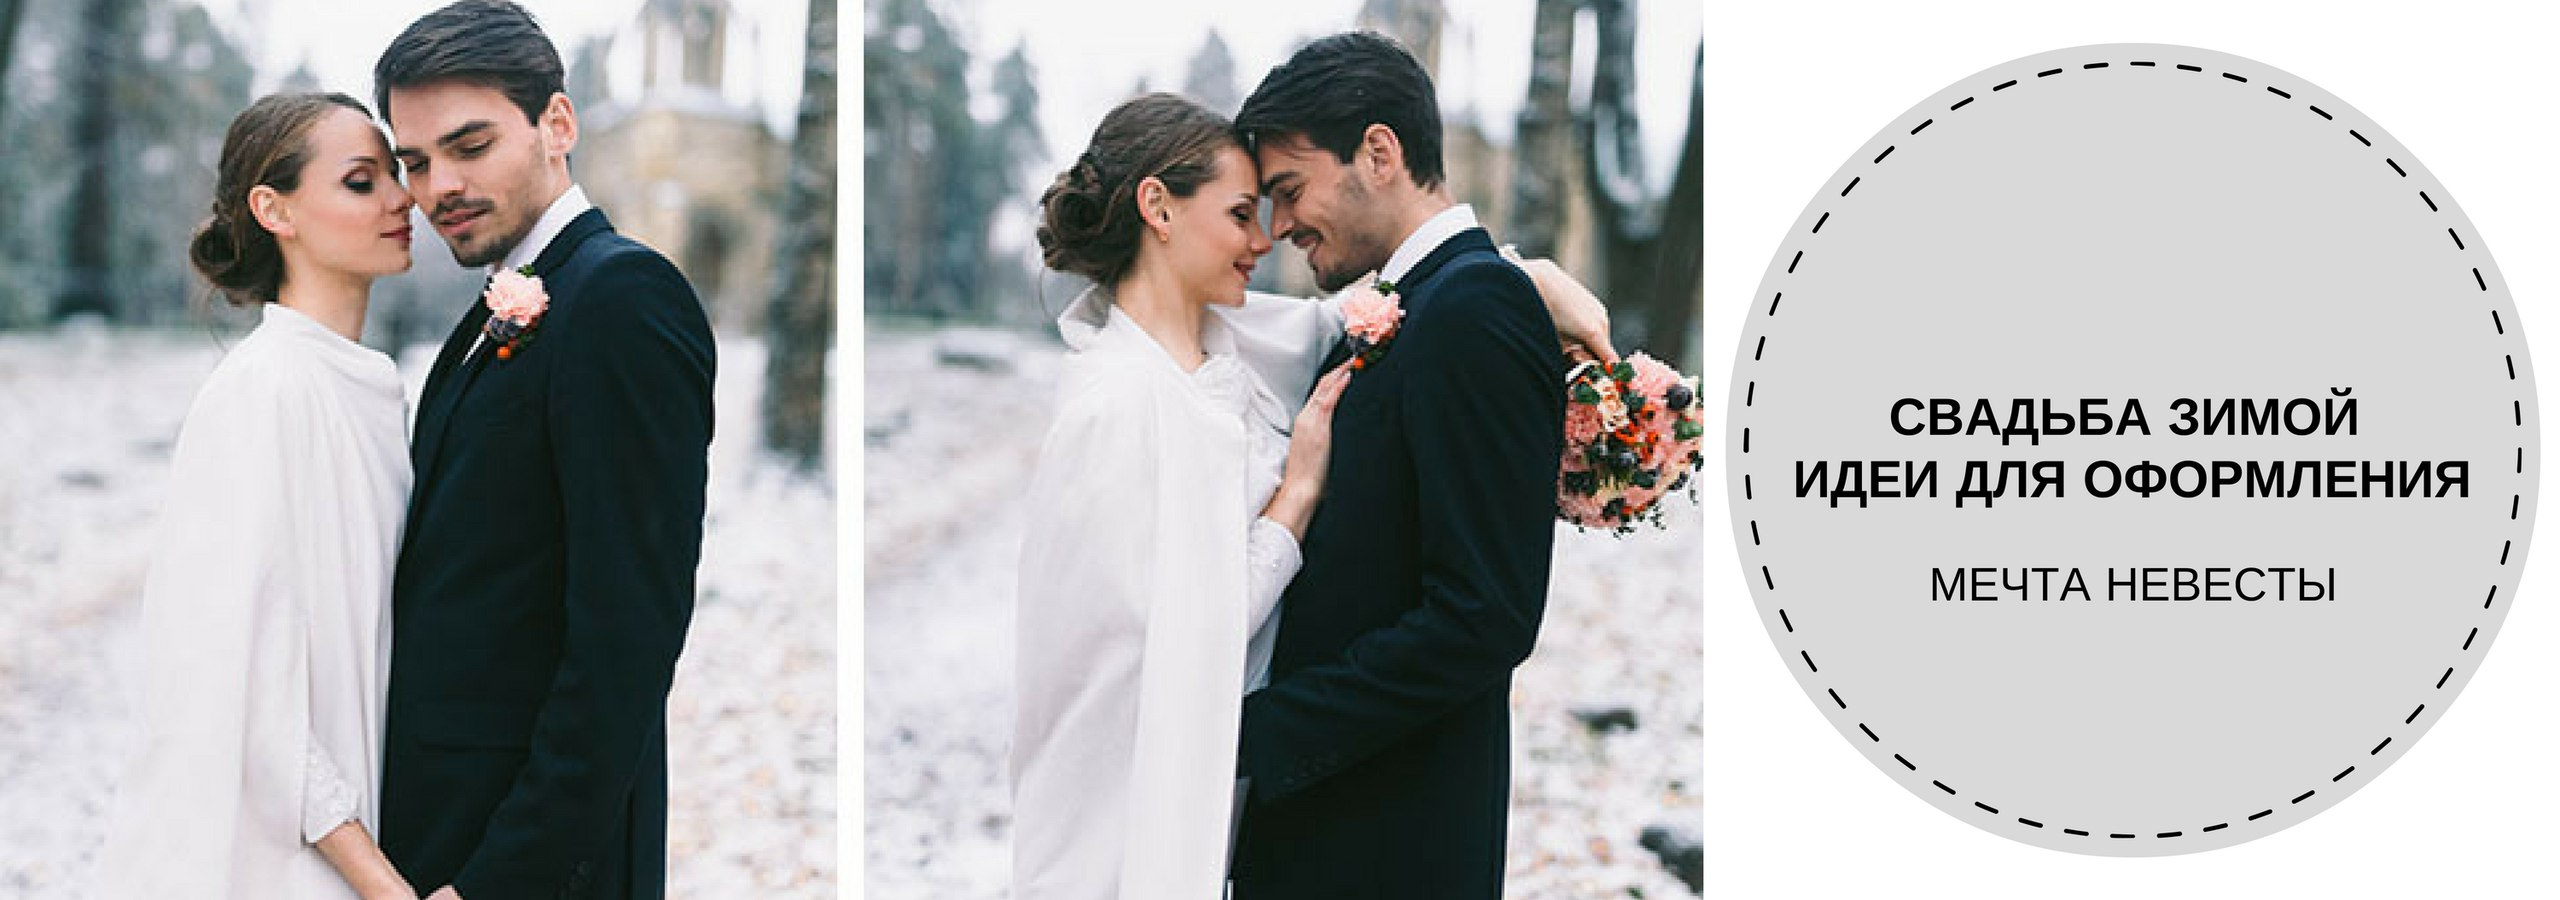 5e3386e9d46fa6c Свадьба зимой: идеи для оформления торжества